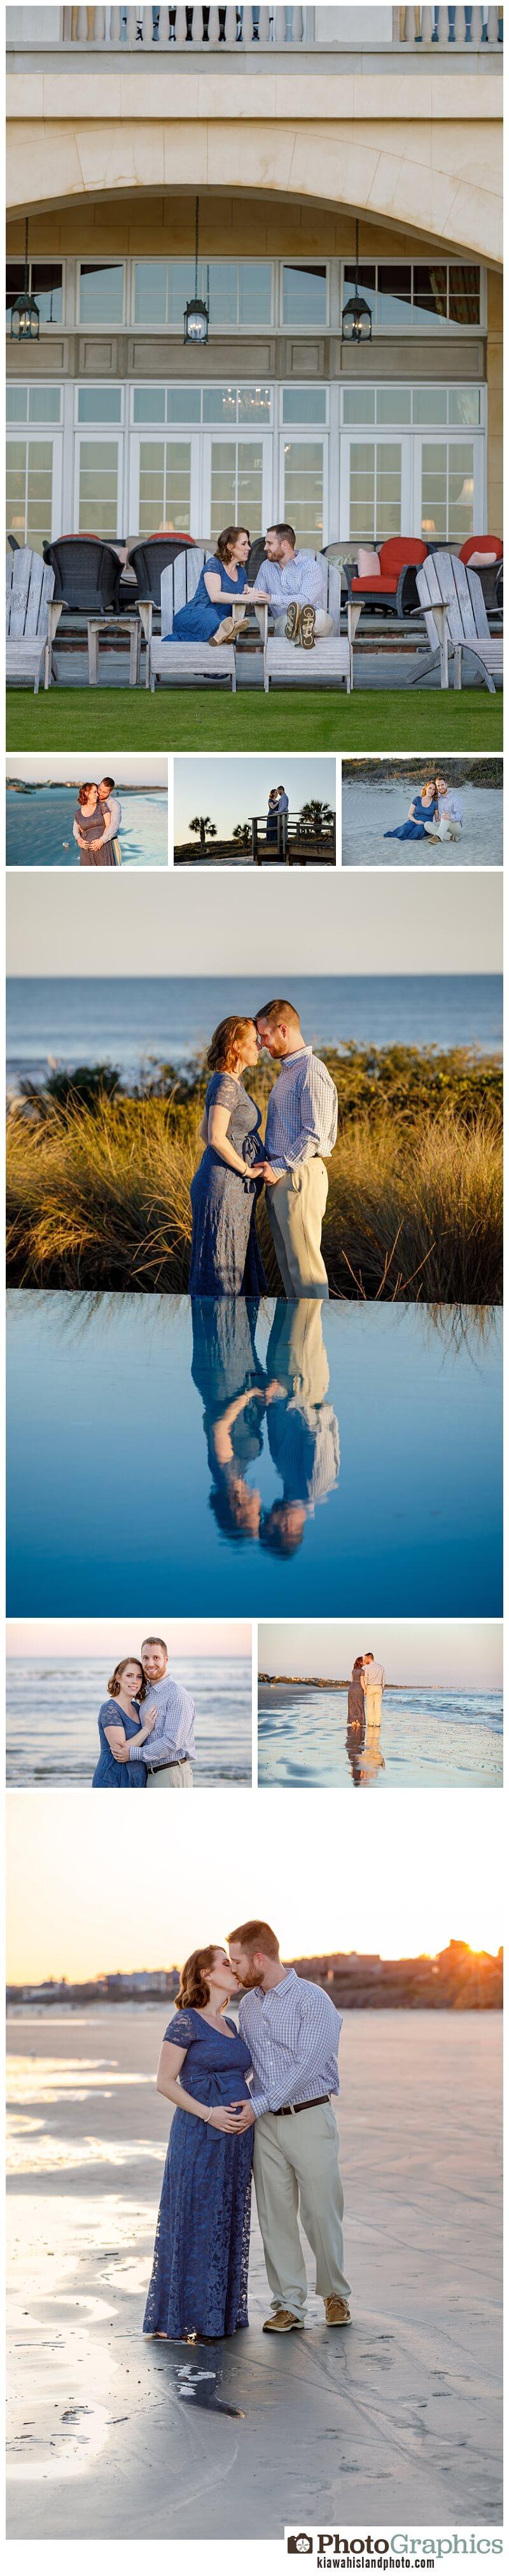 The sanctuary kiawah island baby bump photos husband and wife